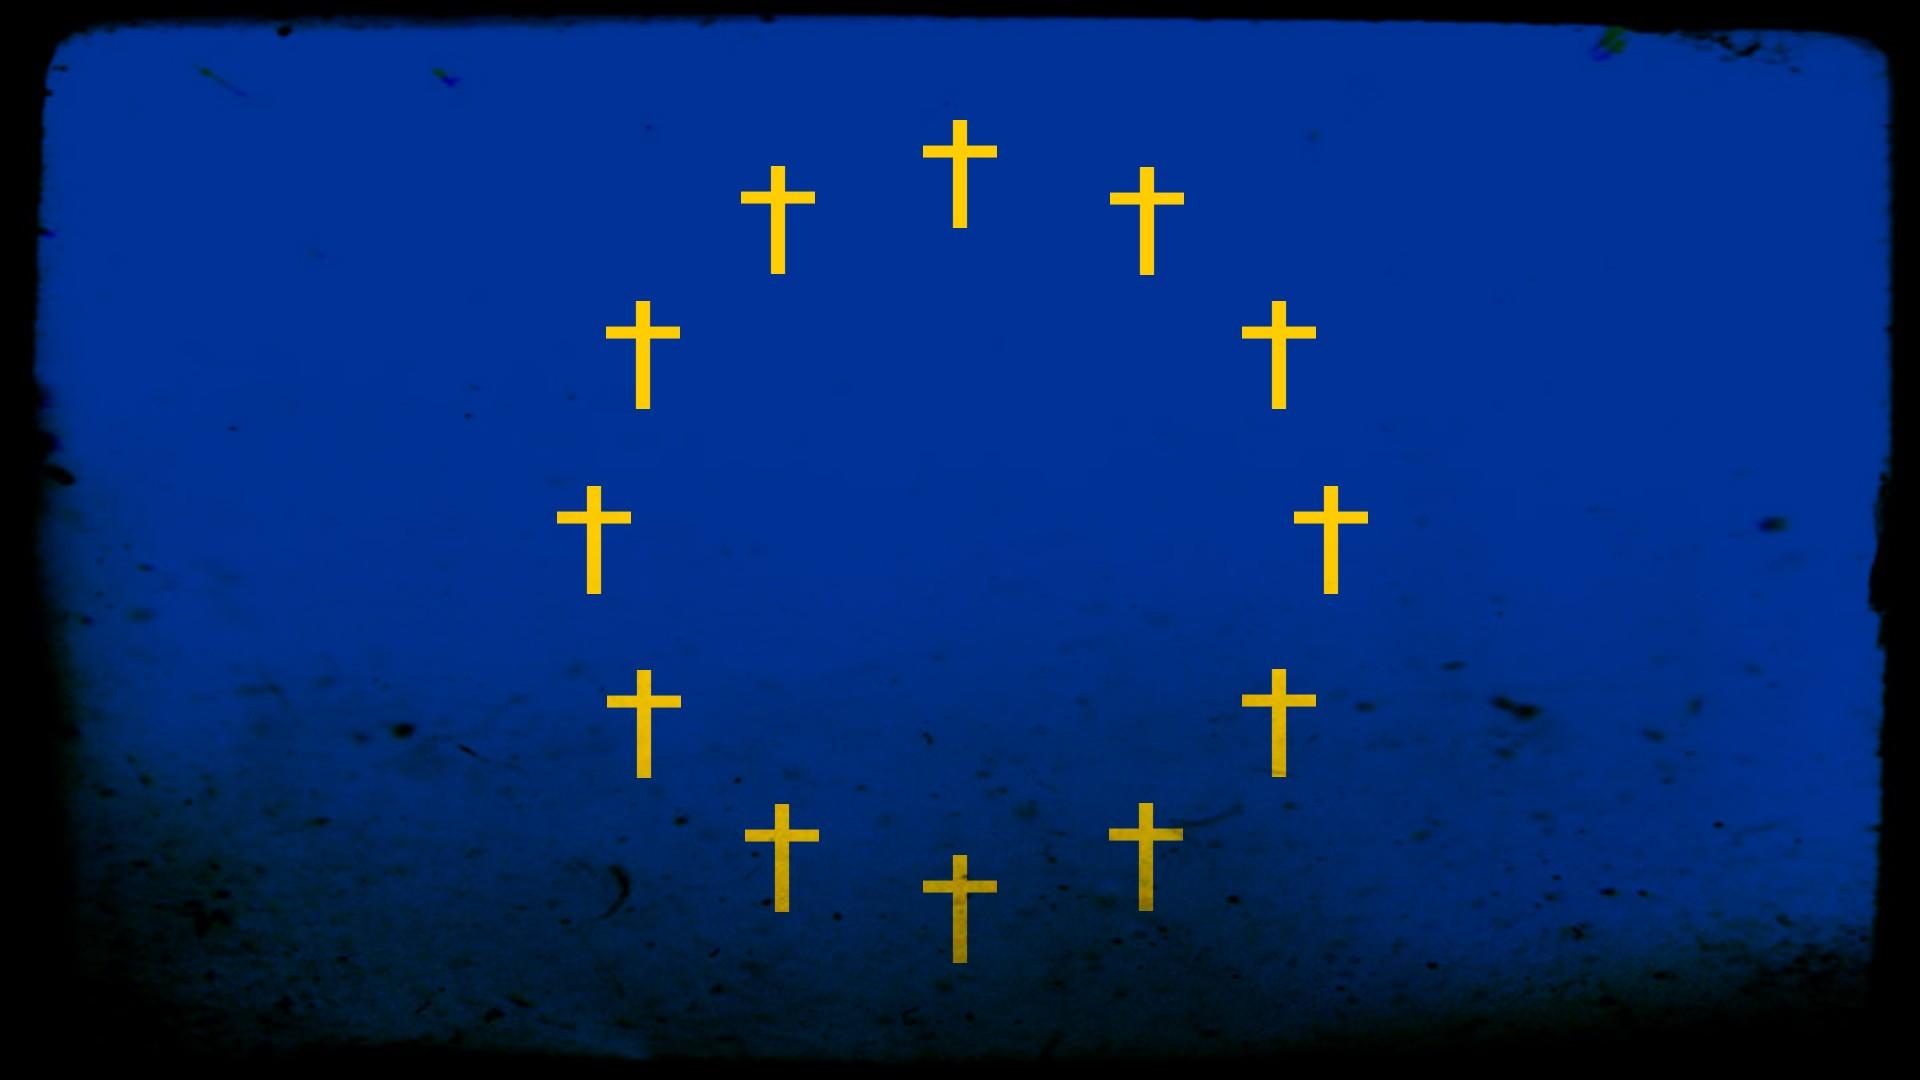 Mord i Europa 4:6